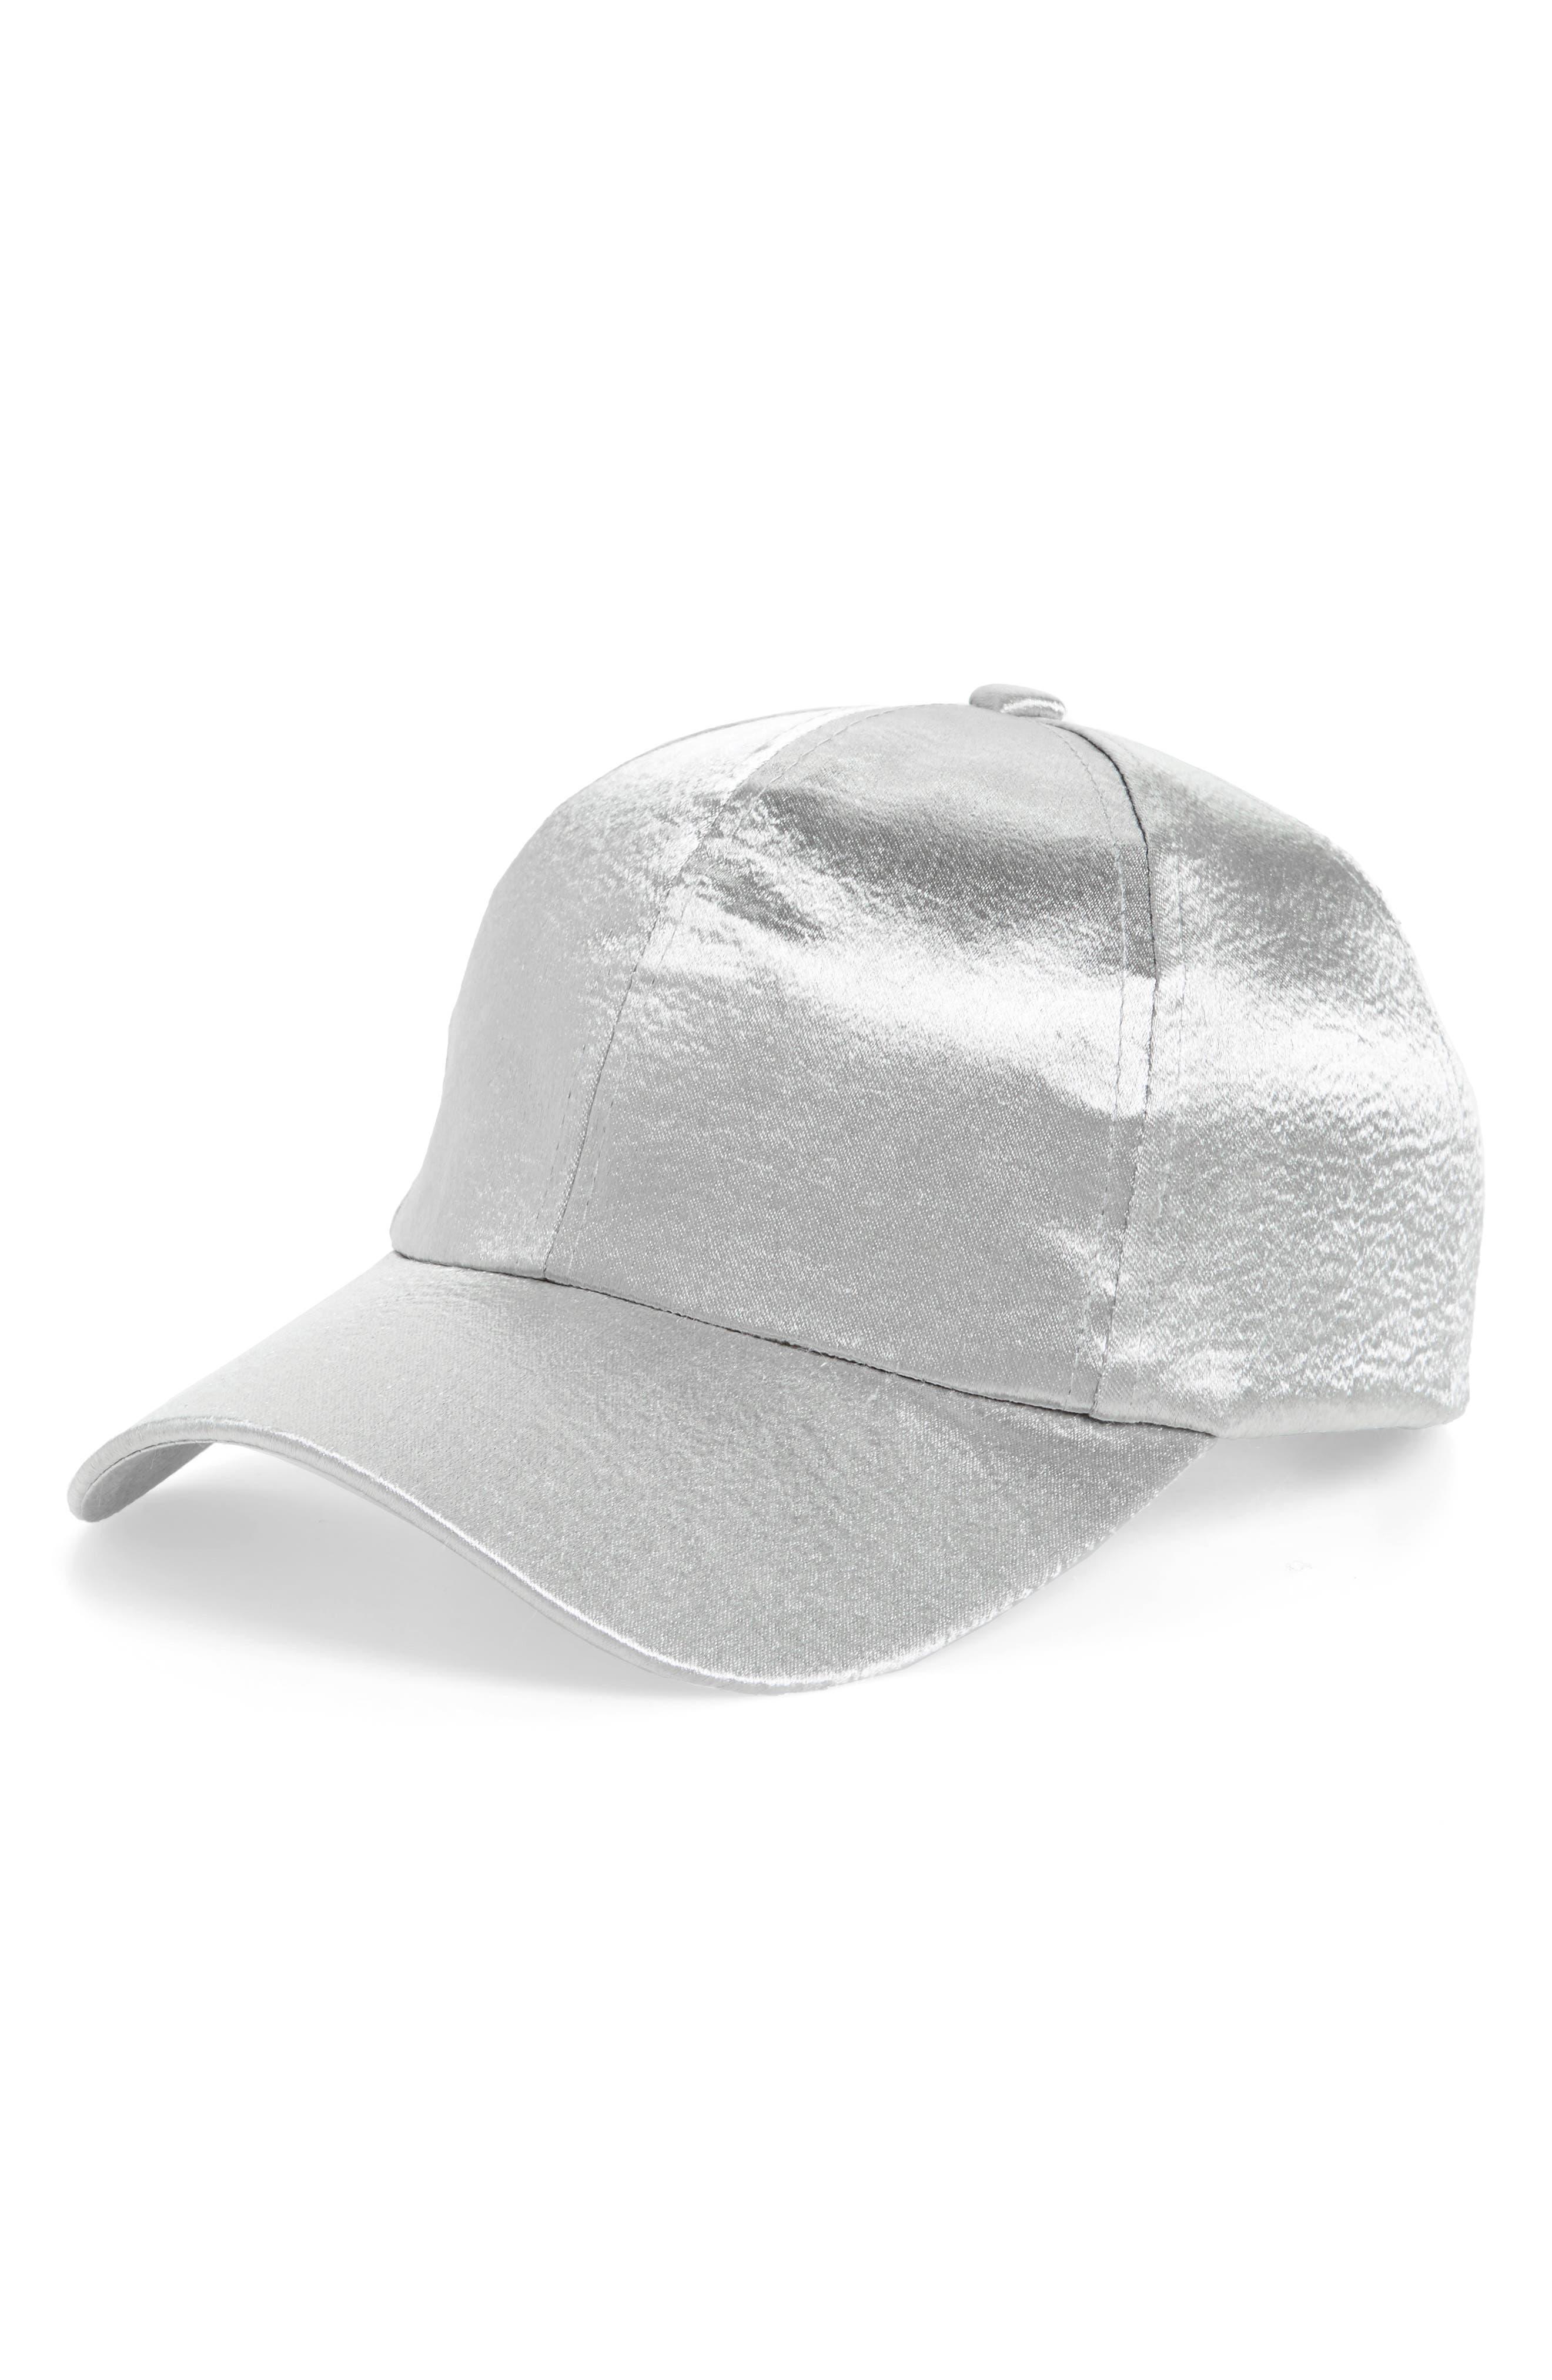 Satin Baseball Cap,                             Main thumbnail 1, color,                             040